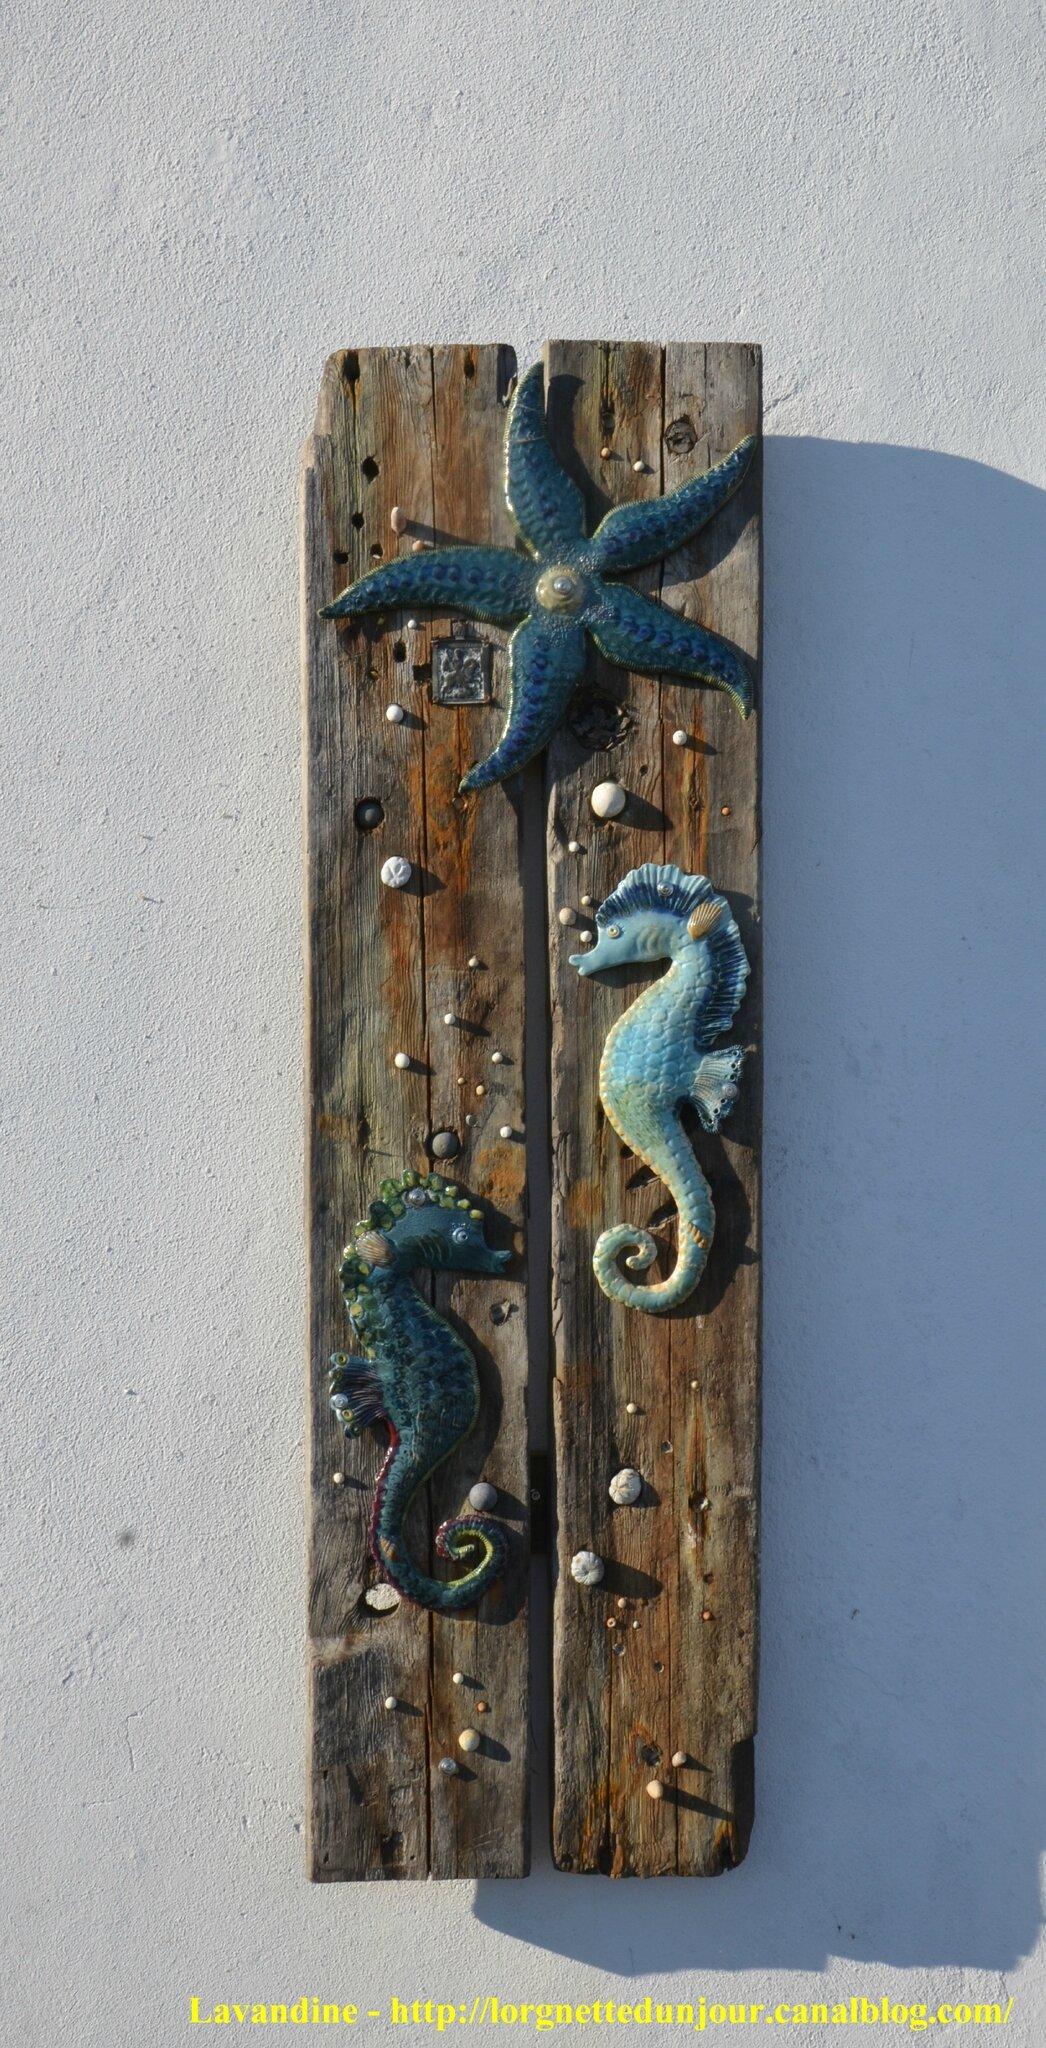 08/12/14 : Klintholm Havn